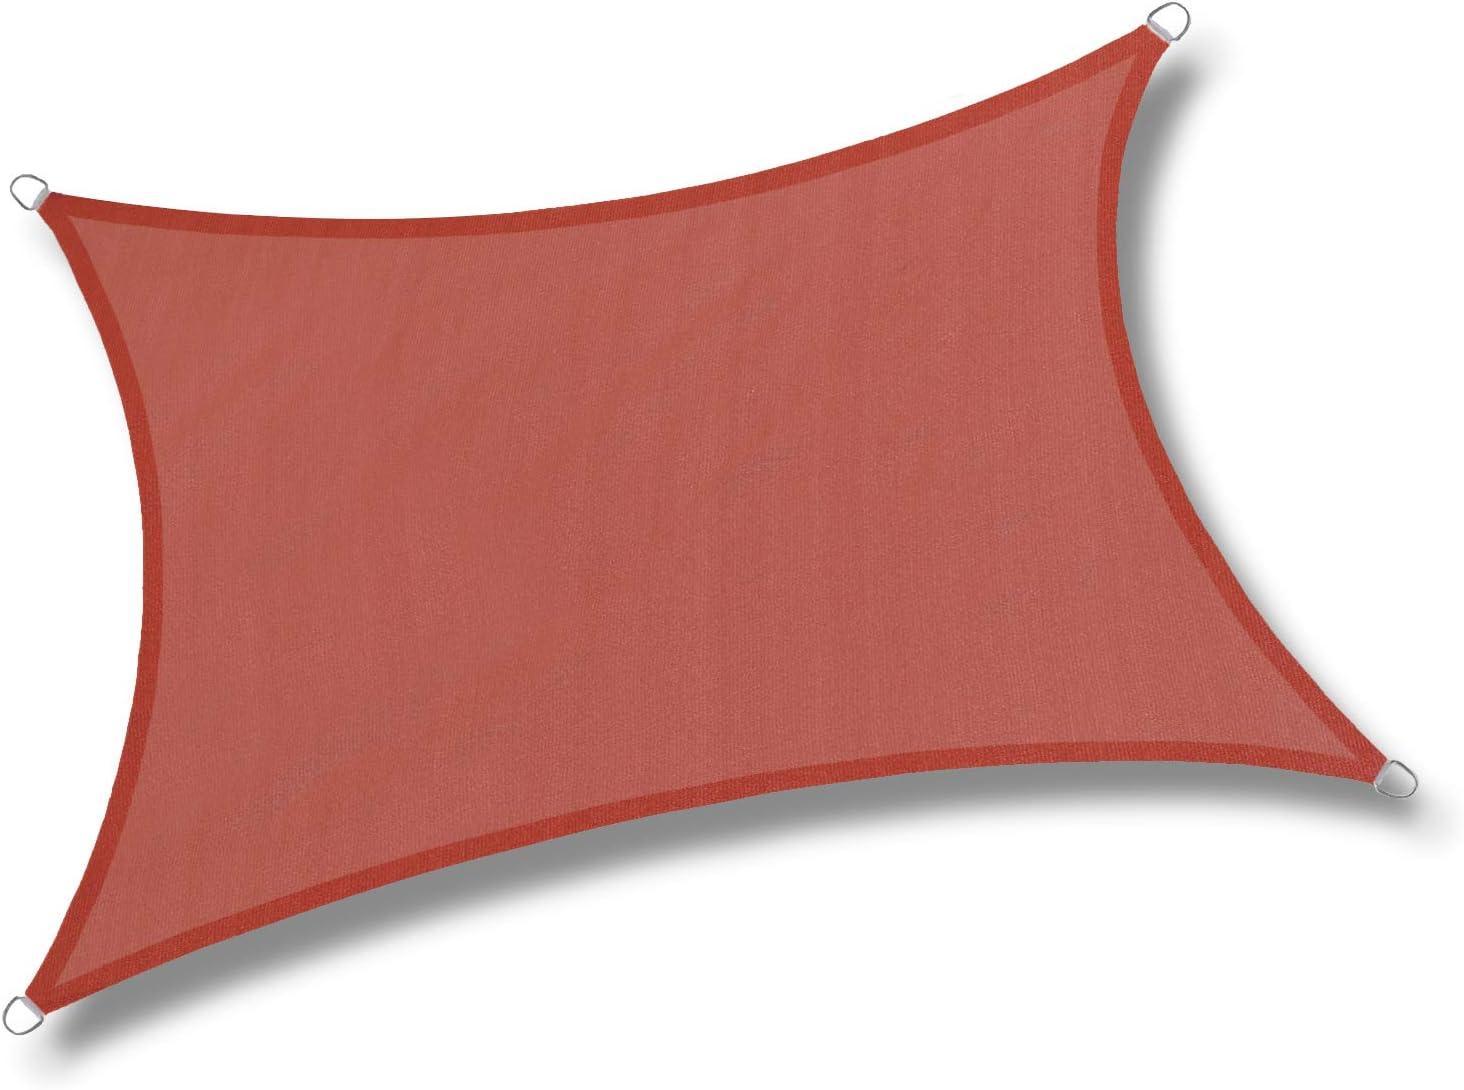 LOVE STORY 6'5'' x 9'10'' Rectangle Terra Red Sun Shade Sail Canopy UV Block Awning for Outdoor Patio Garden Backyard